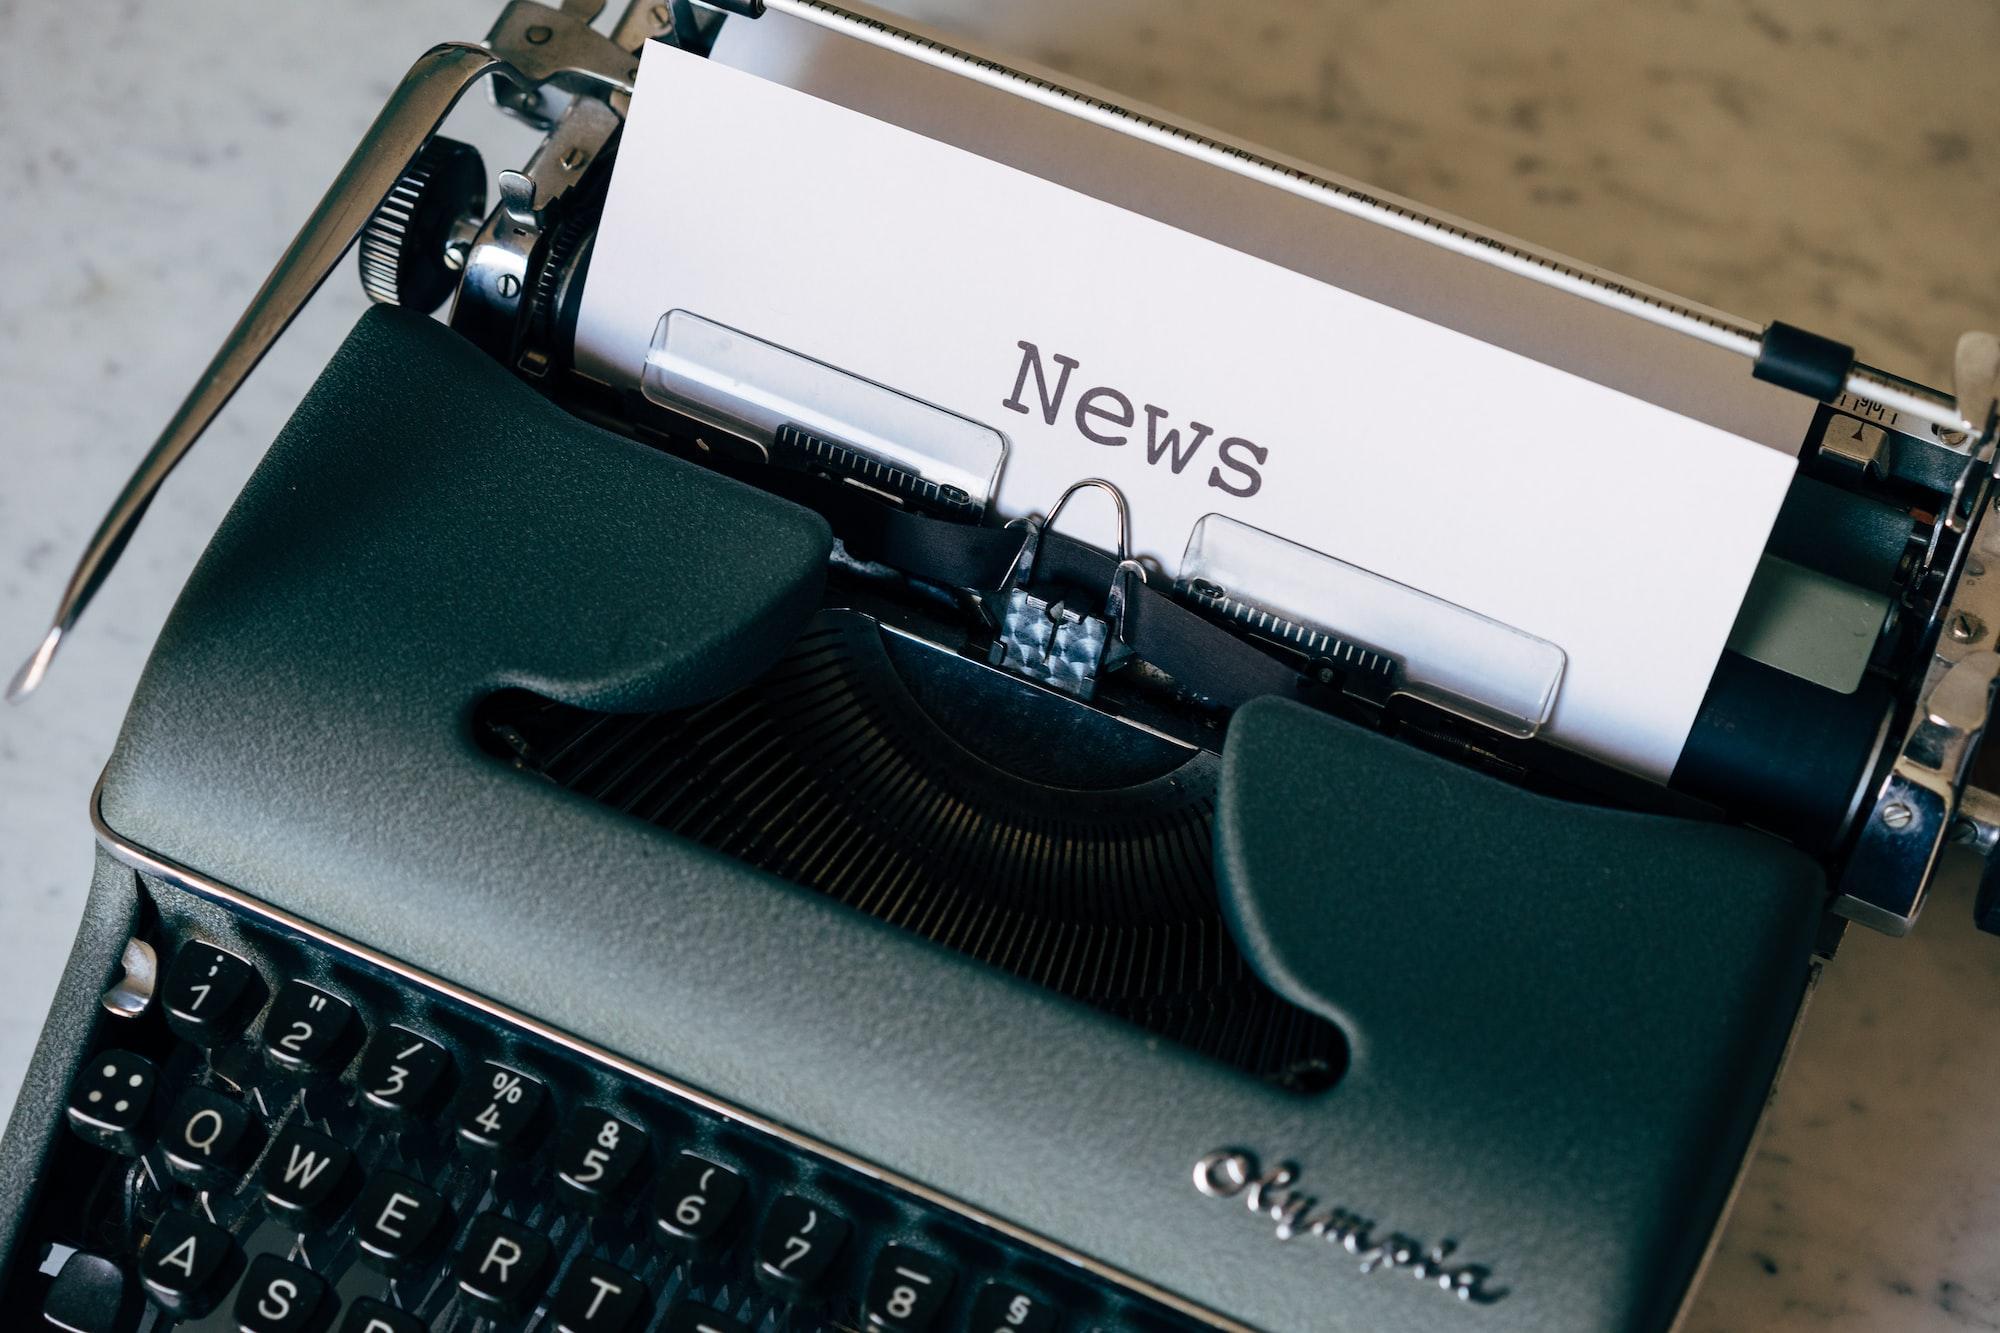 Inside the News